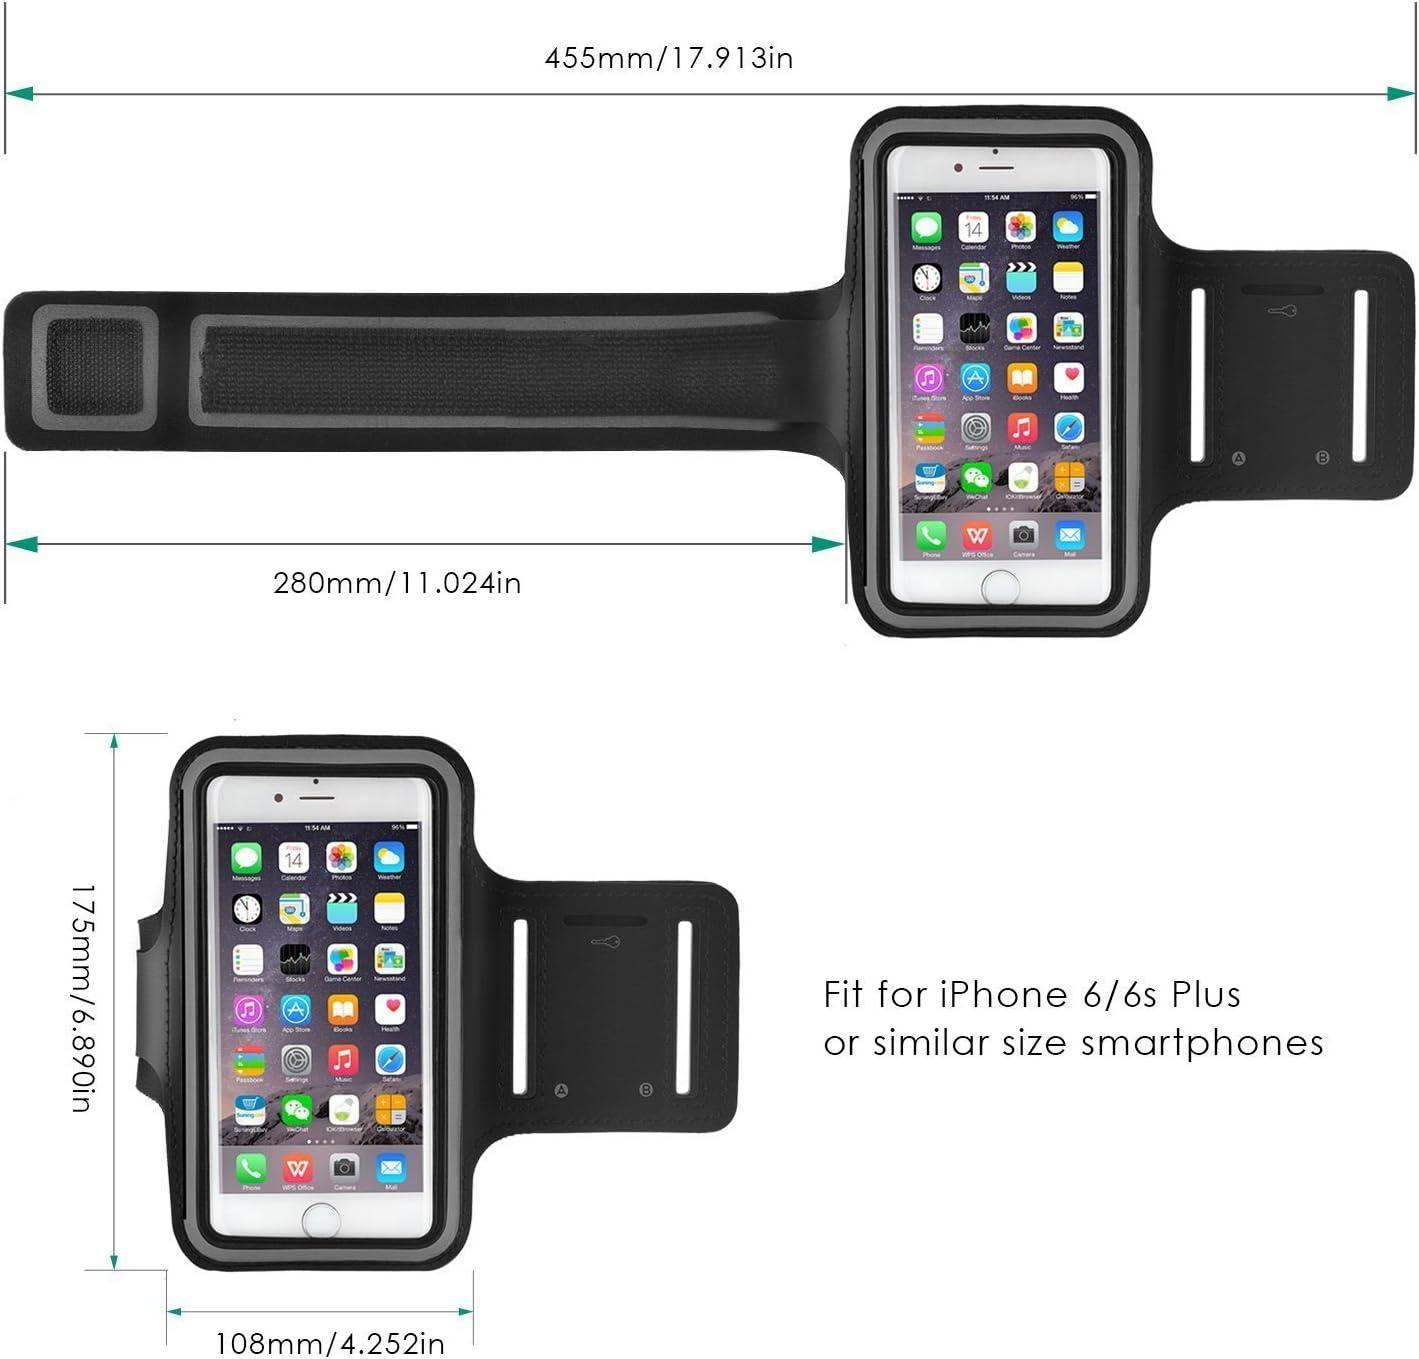 MM-Mobitec Motorola Moto X4 Sportarmband Neopren Fitness Armband Wasserfestes Sport-Armband mit Schl/üsselhalter